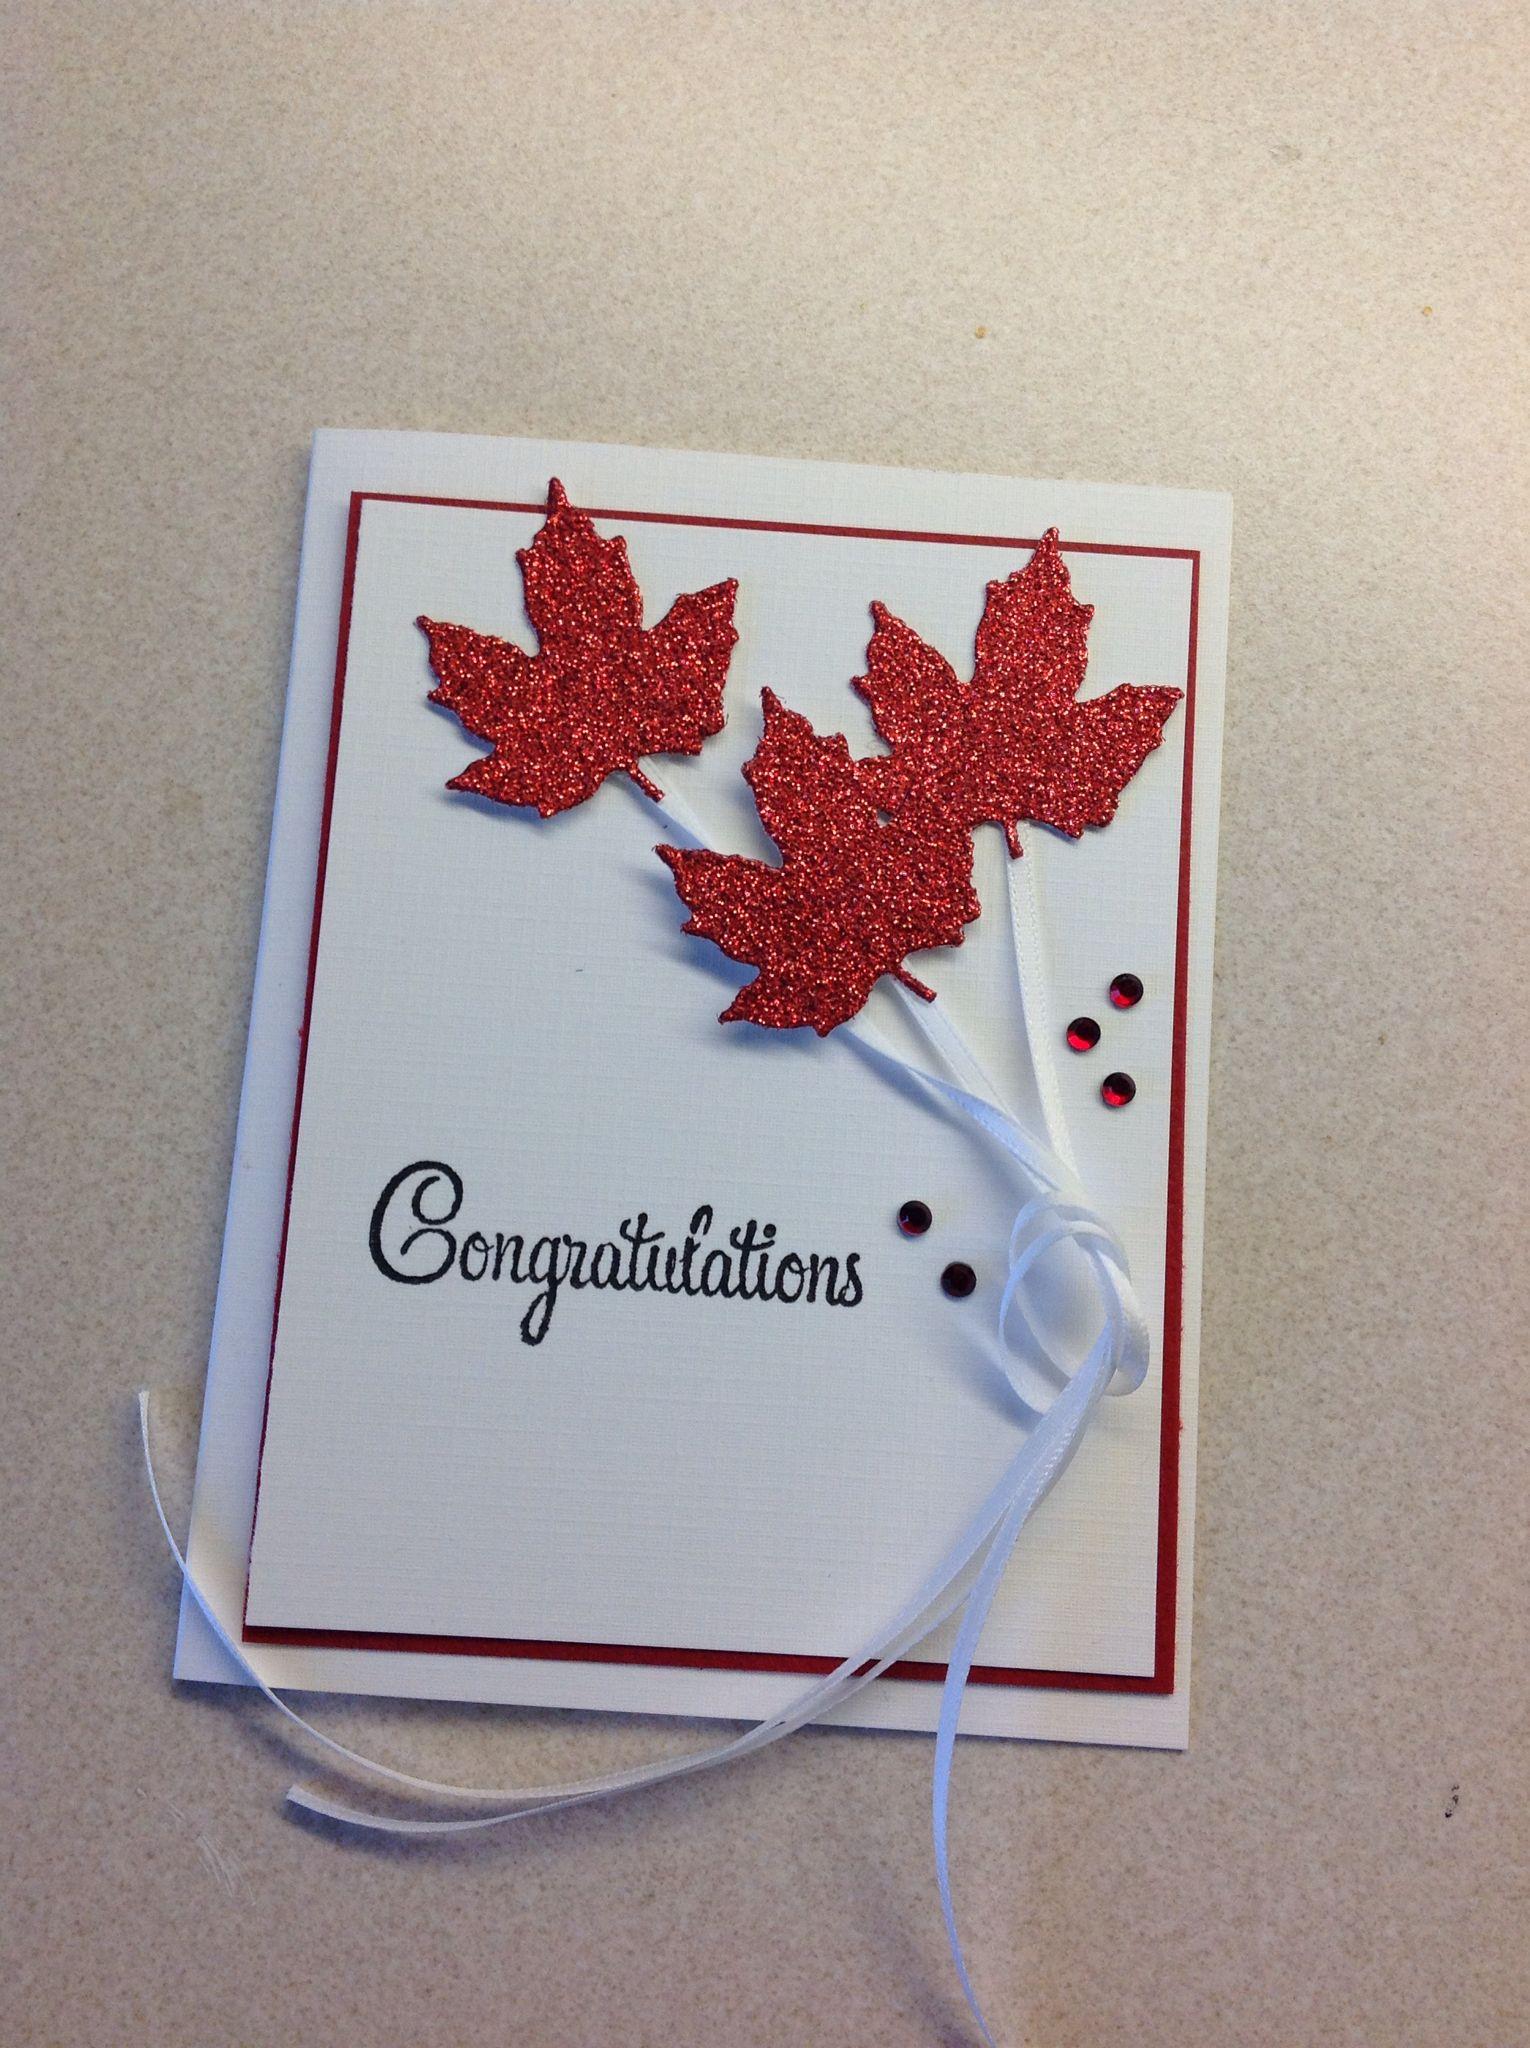 Congratulations on a canadian citizen card